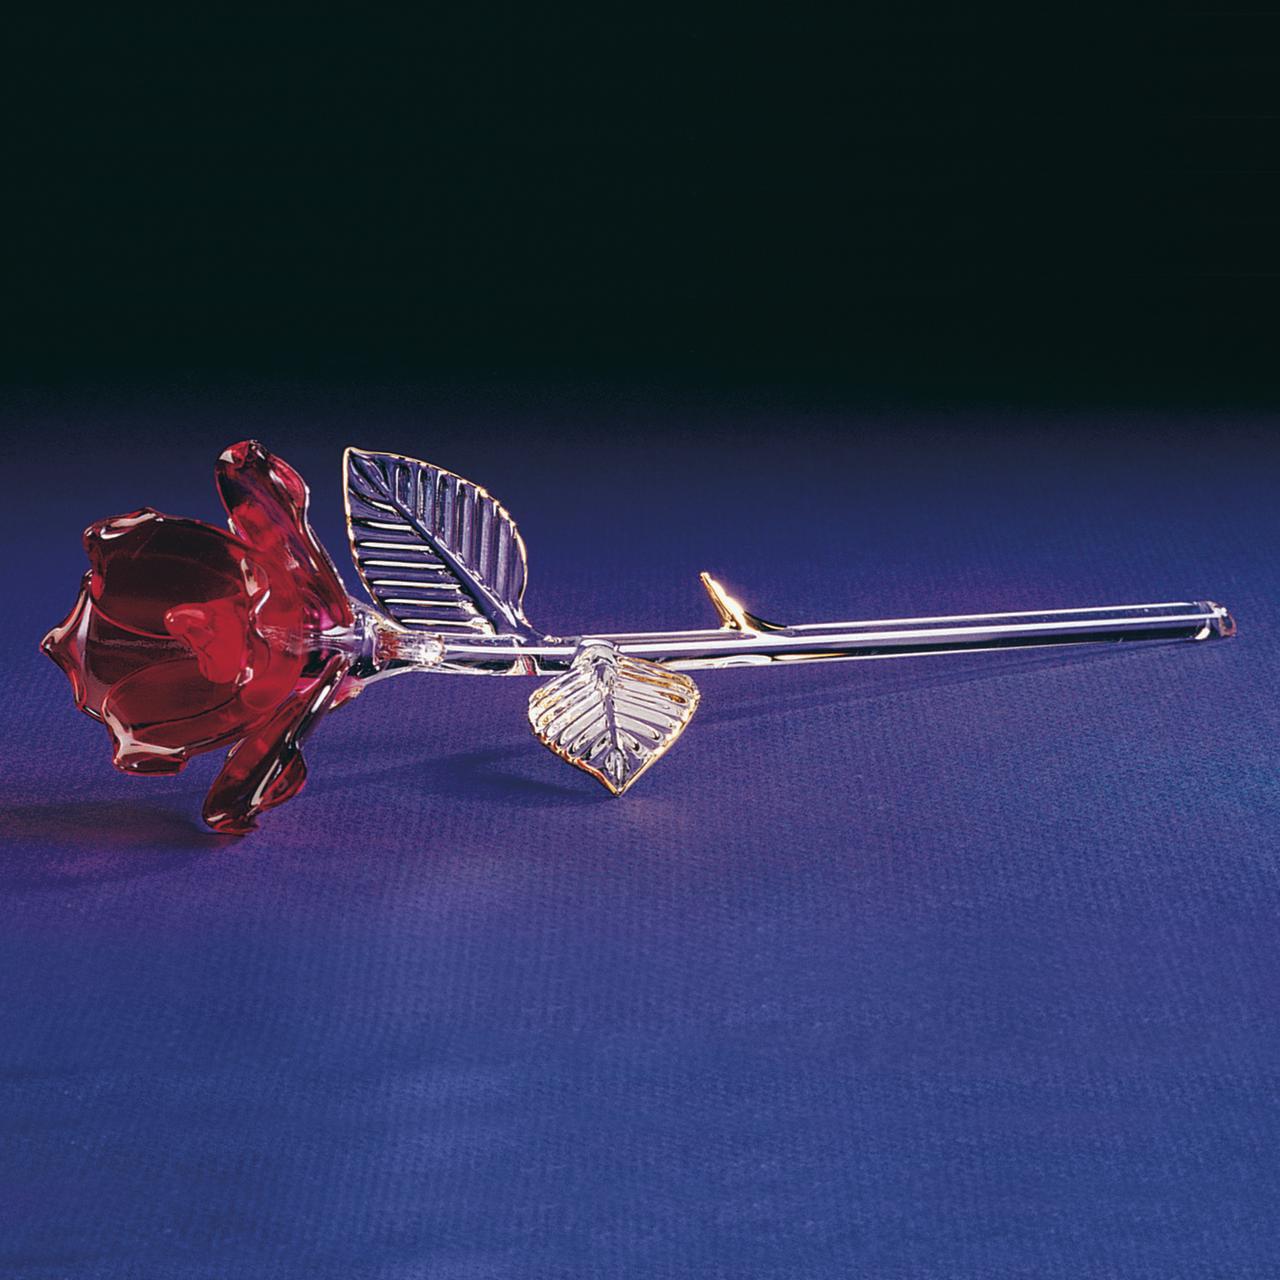 Red Rose Glass Figurine Floral Garden Nautical Keepsake Glas Baron Love For Women